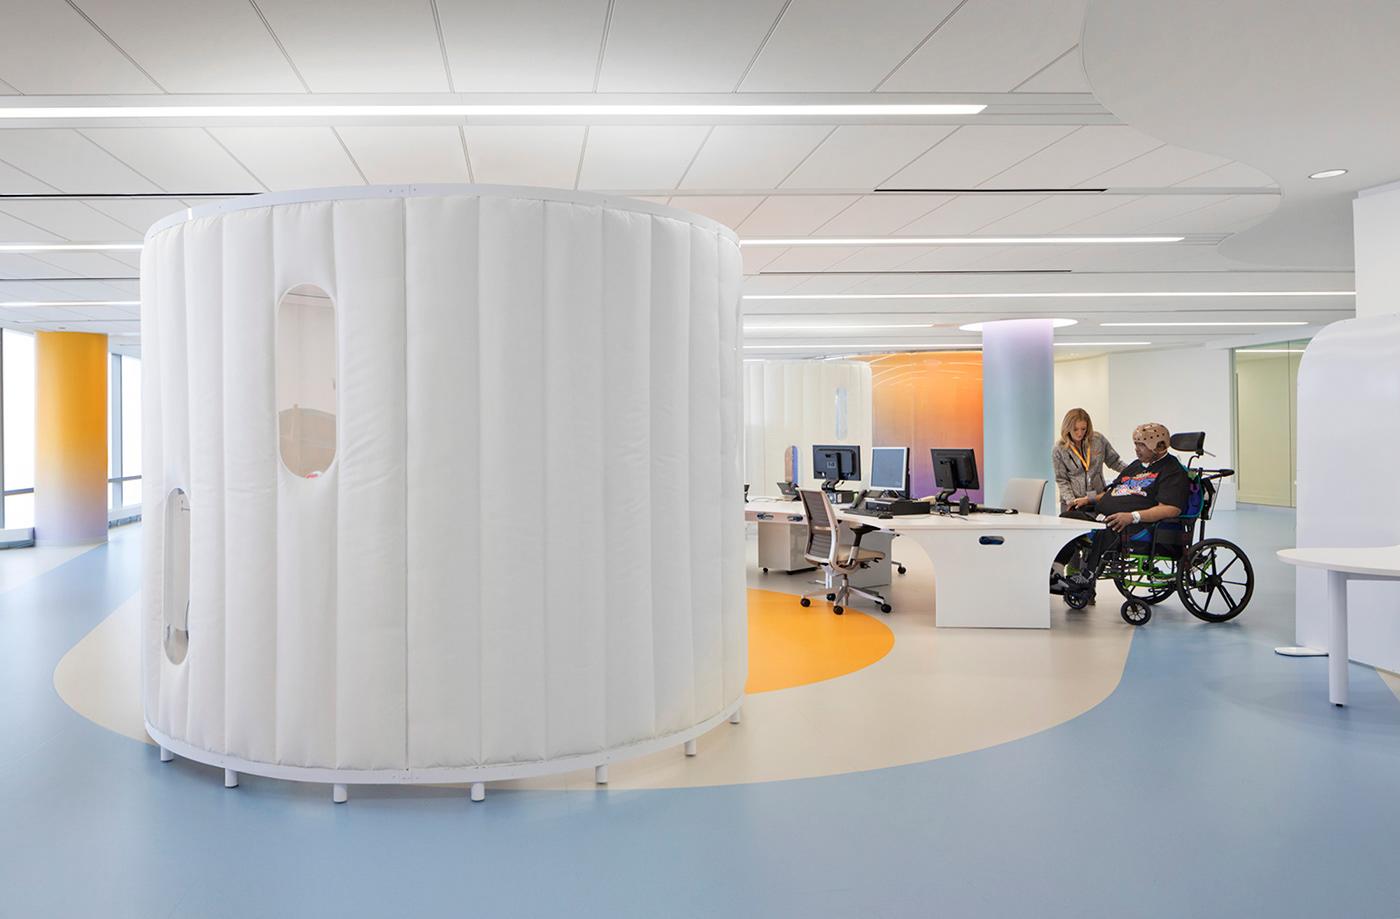 architecture chicago design environmental graphics graphic healthcare hospital Interior Architecture Interior rehabilitation